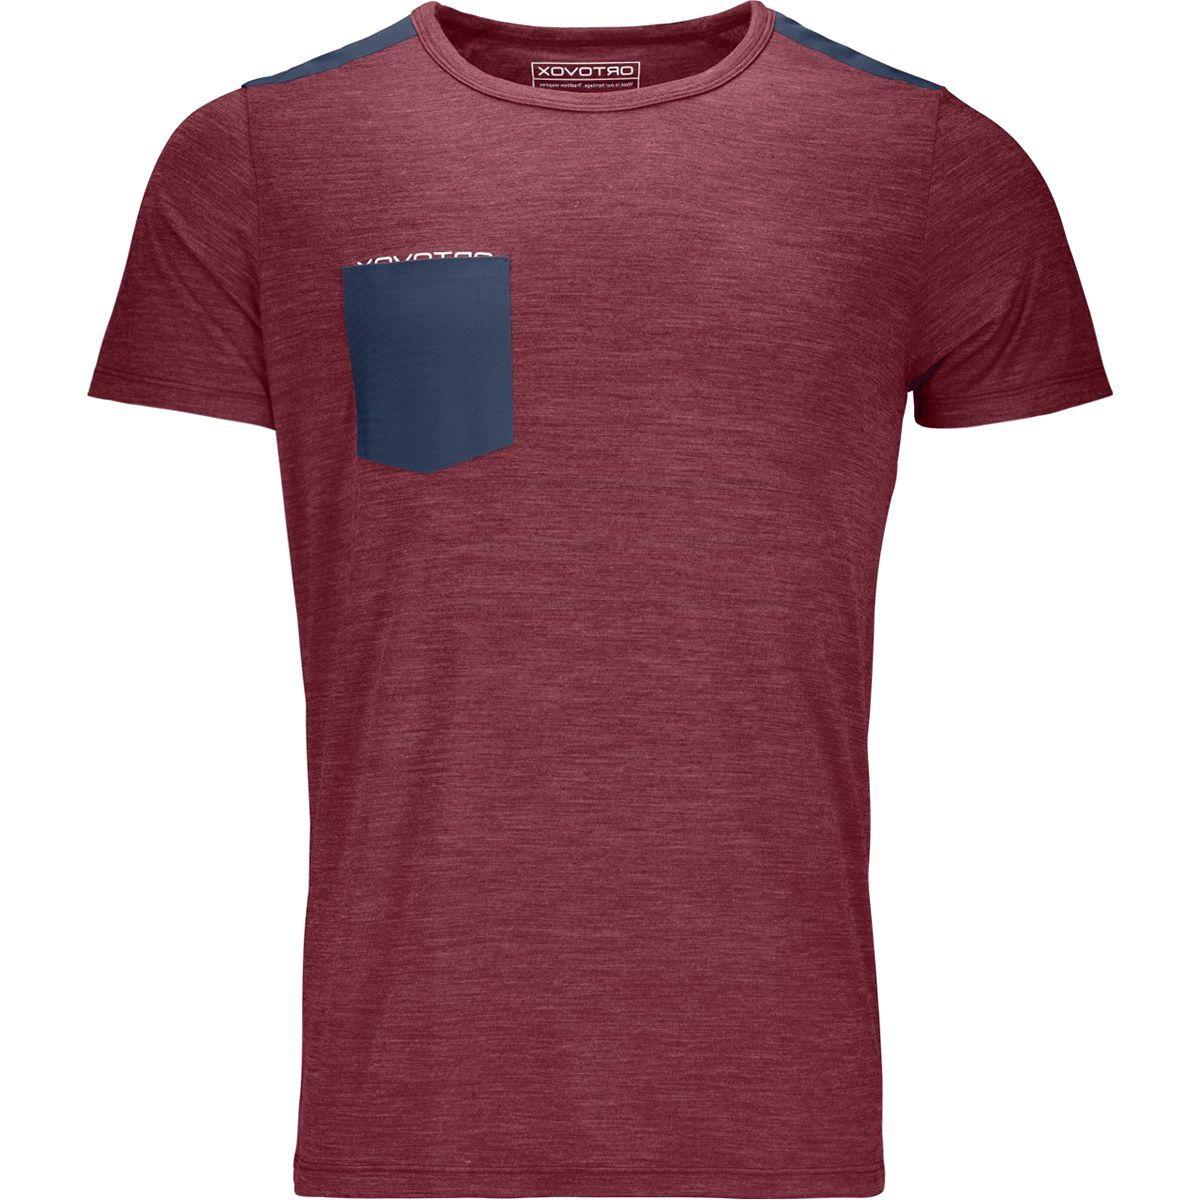 Ortovox 120 Cool Tec Short-Sleeve T-Shirt - Men's